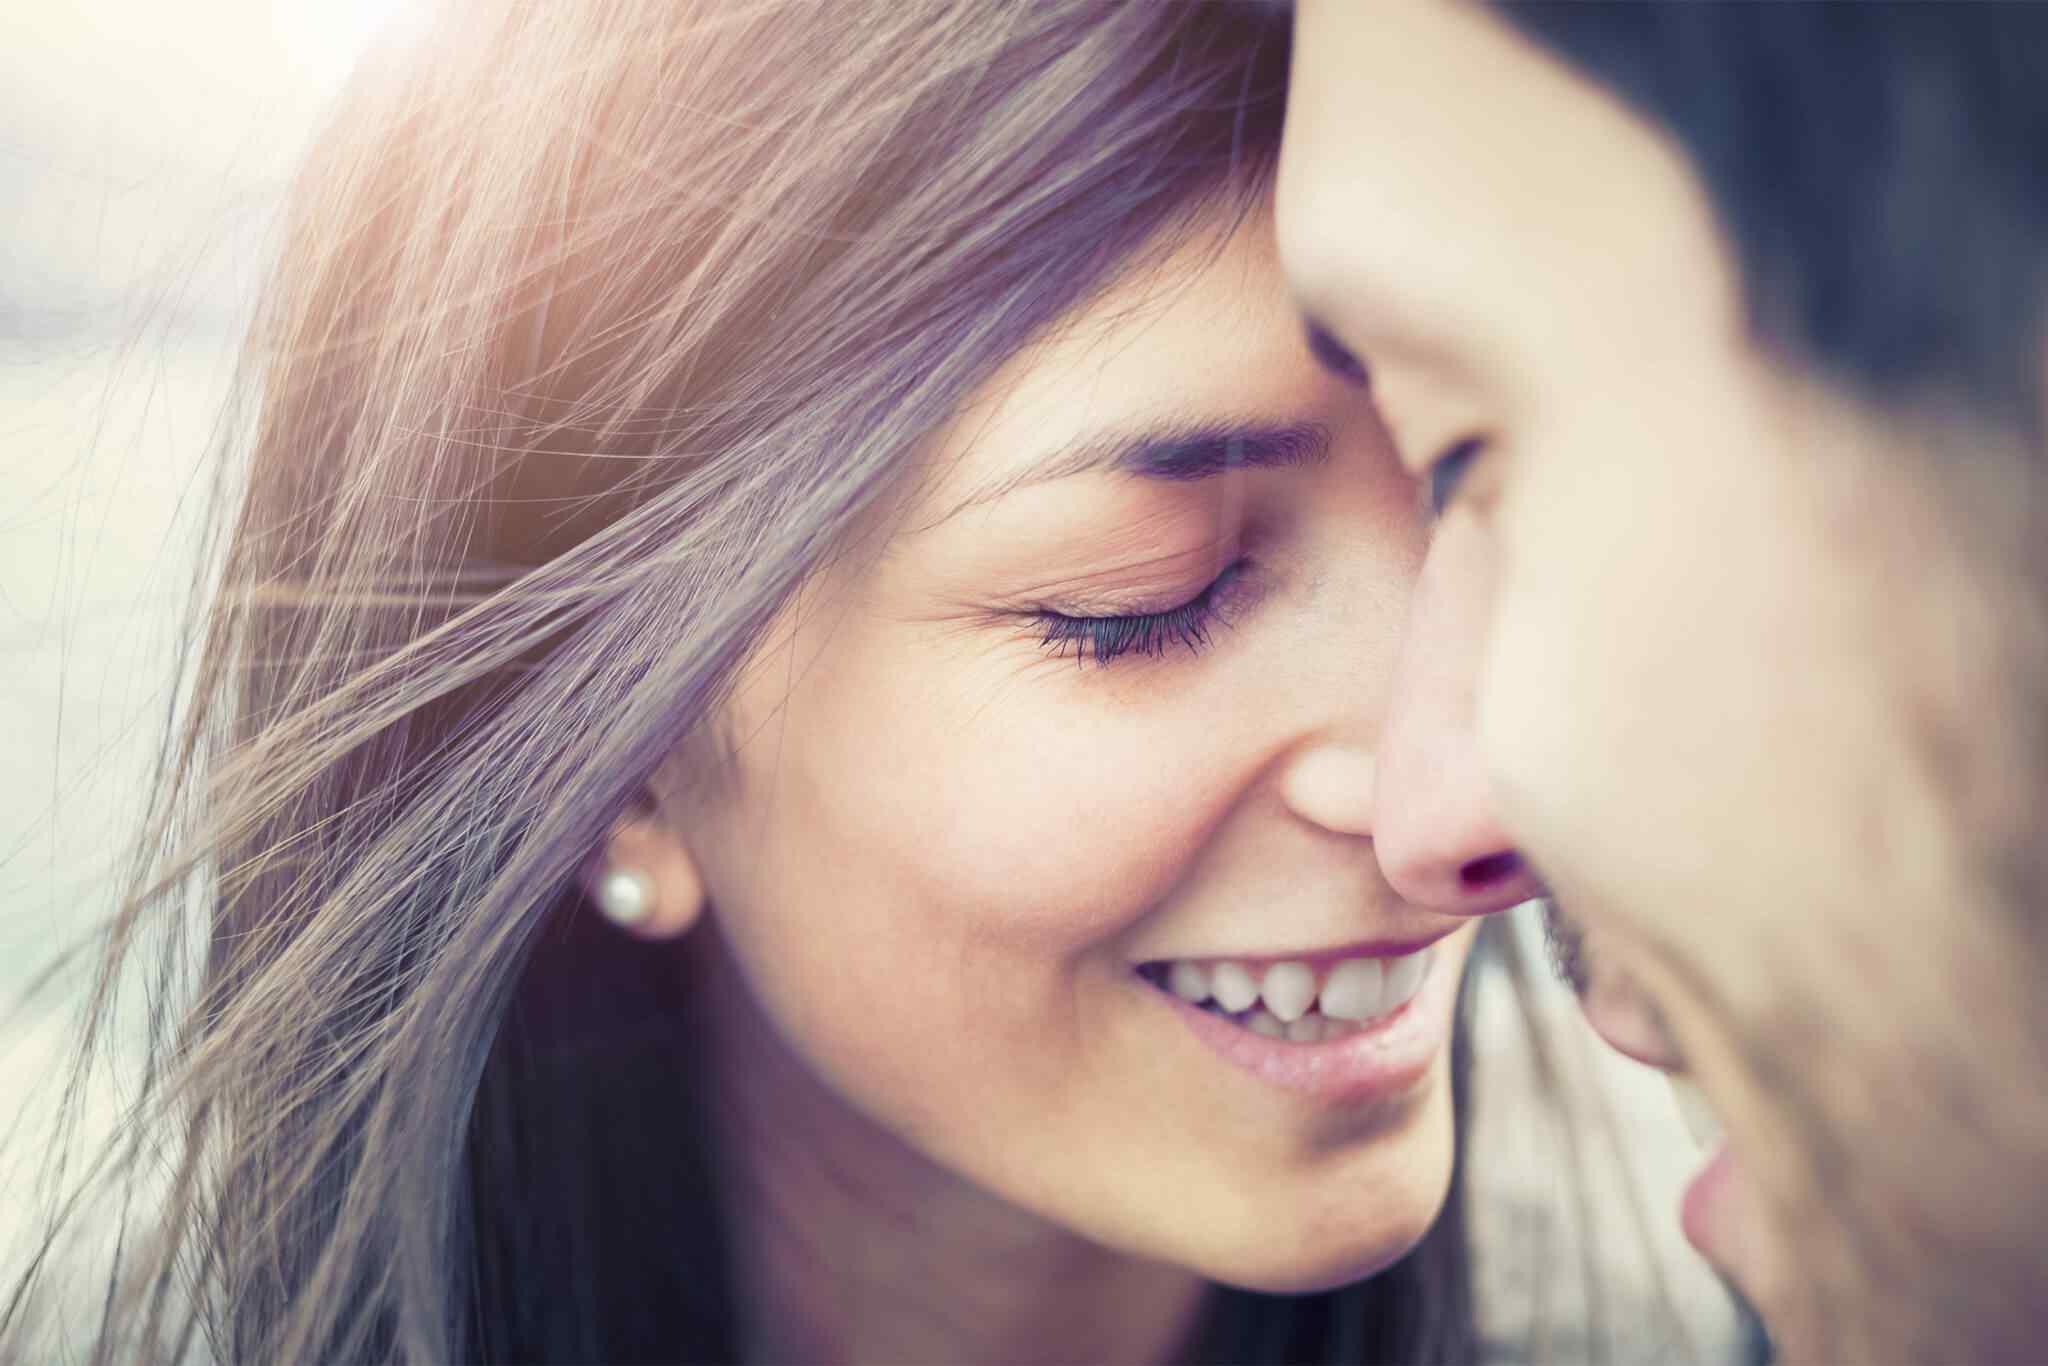 http://gotitasdepoliamor.com/wp-content/uploads/2018/01/img-class-marriage-01.jpg